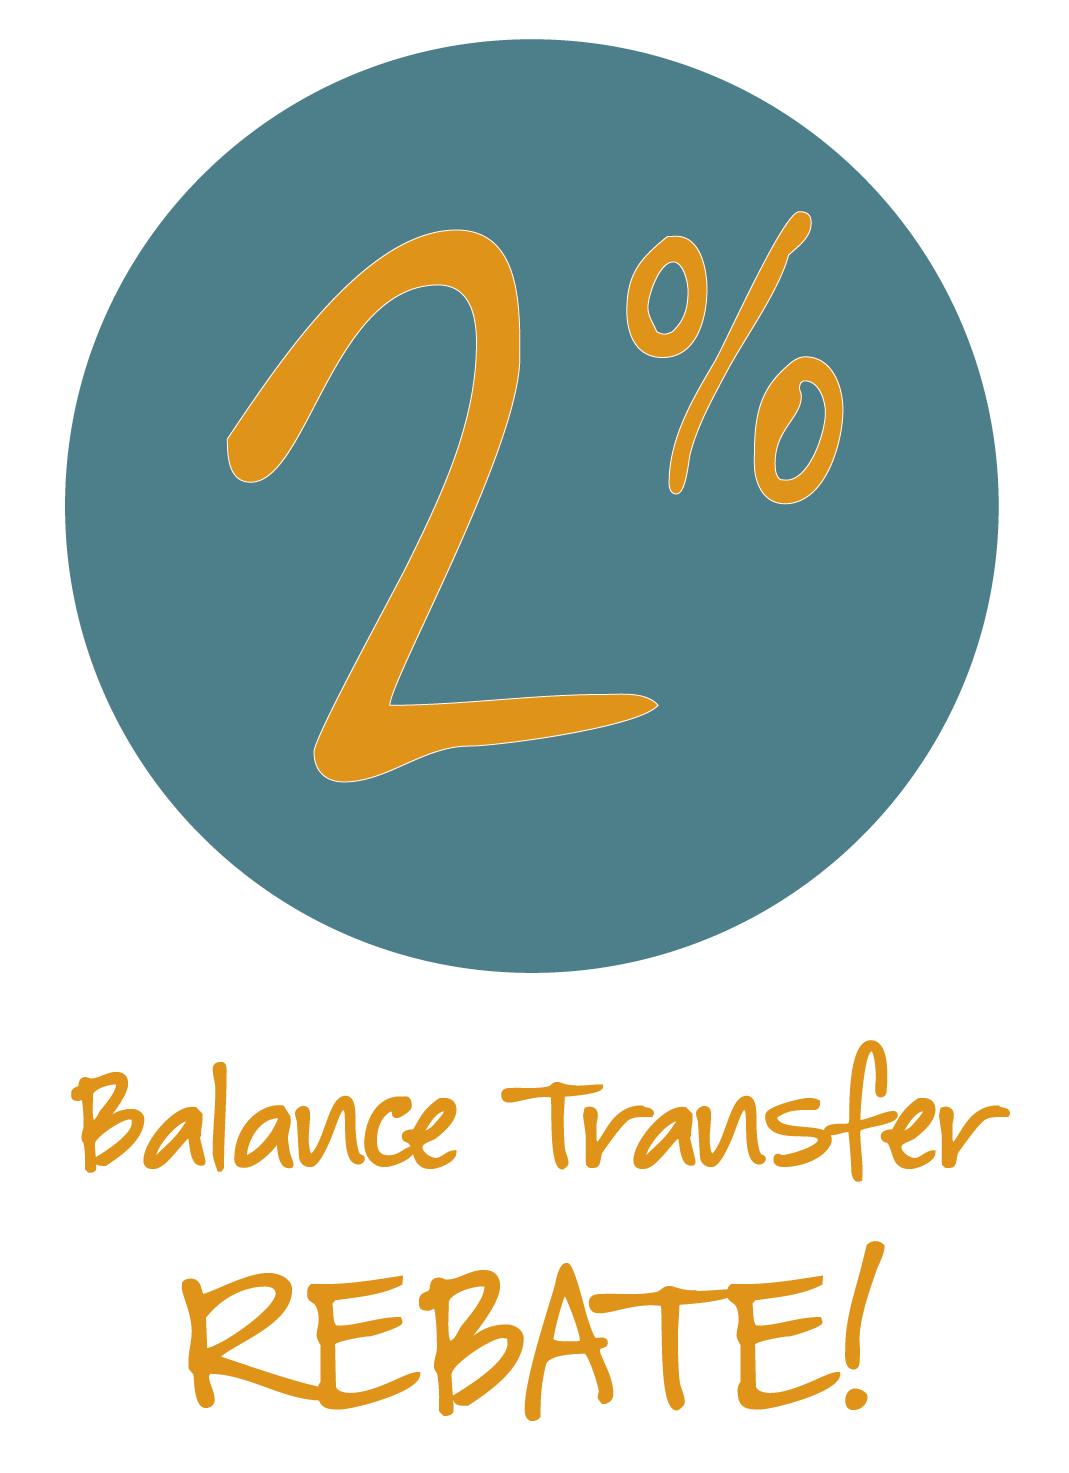 0921 2balancetransfer email2 website